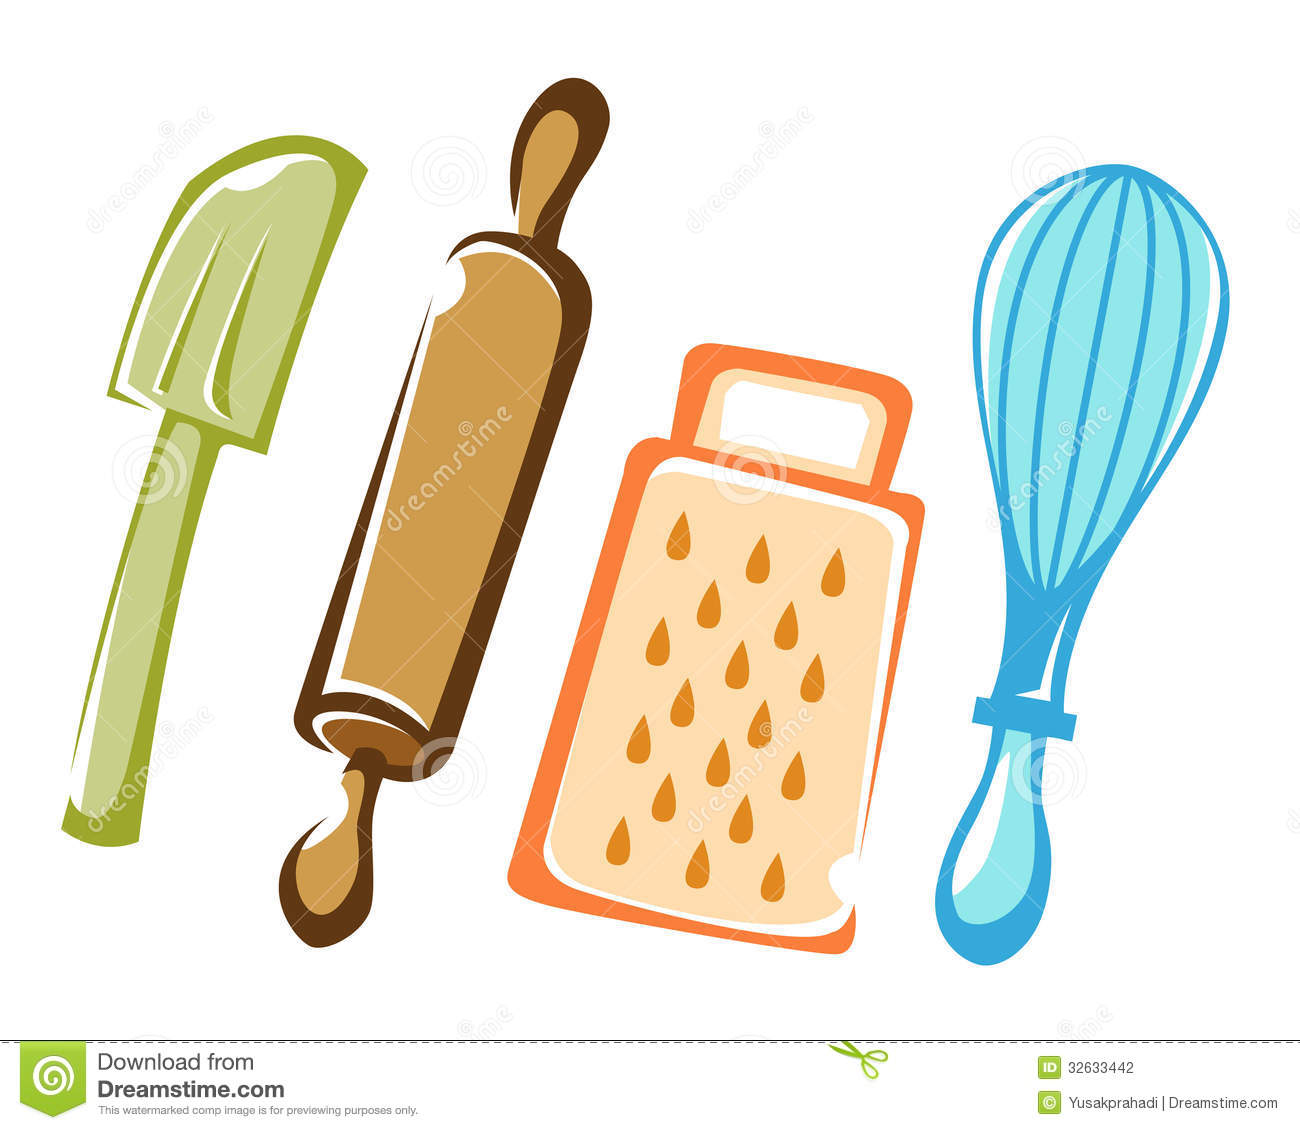 Kitchen Tools Clip Art Kitchen Tools Cli-Kitchen Tools Clip Art Kitchen Tools Clip Art Kitchen Tools-13